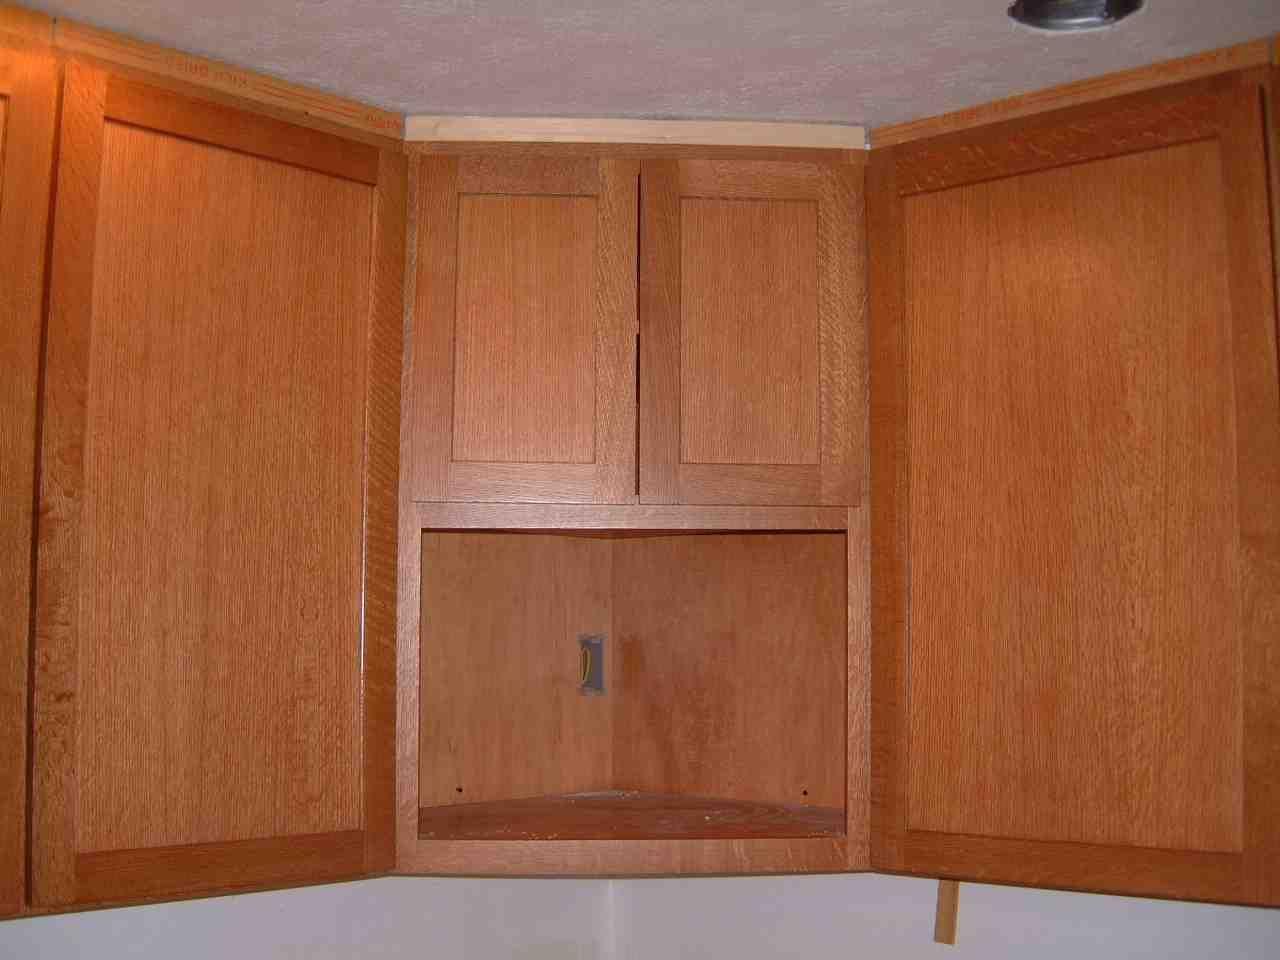 Microwave Furniture Cabinet Corner Microwave Cabinet Better Microwave Cabinet Pinterest